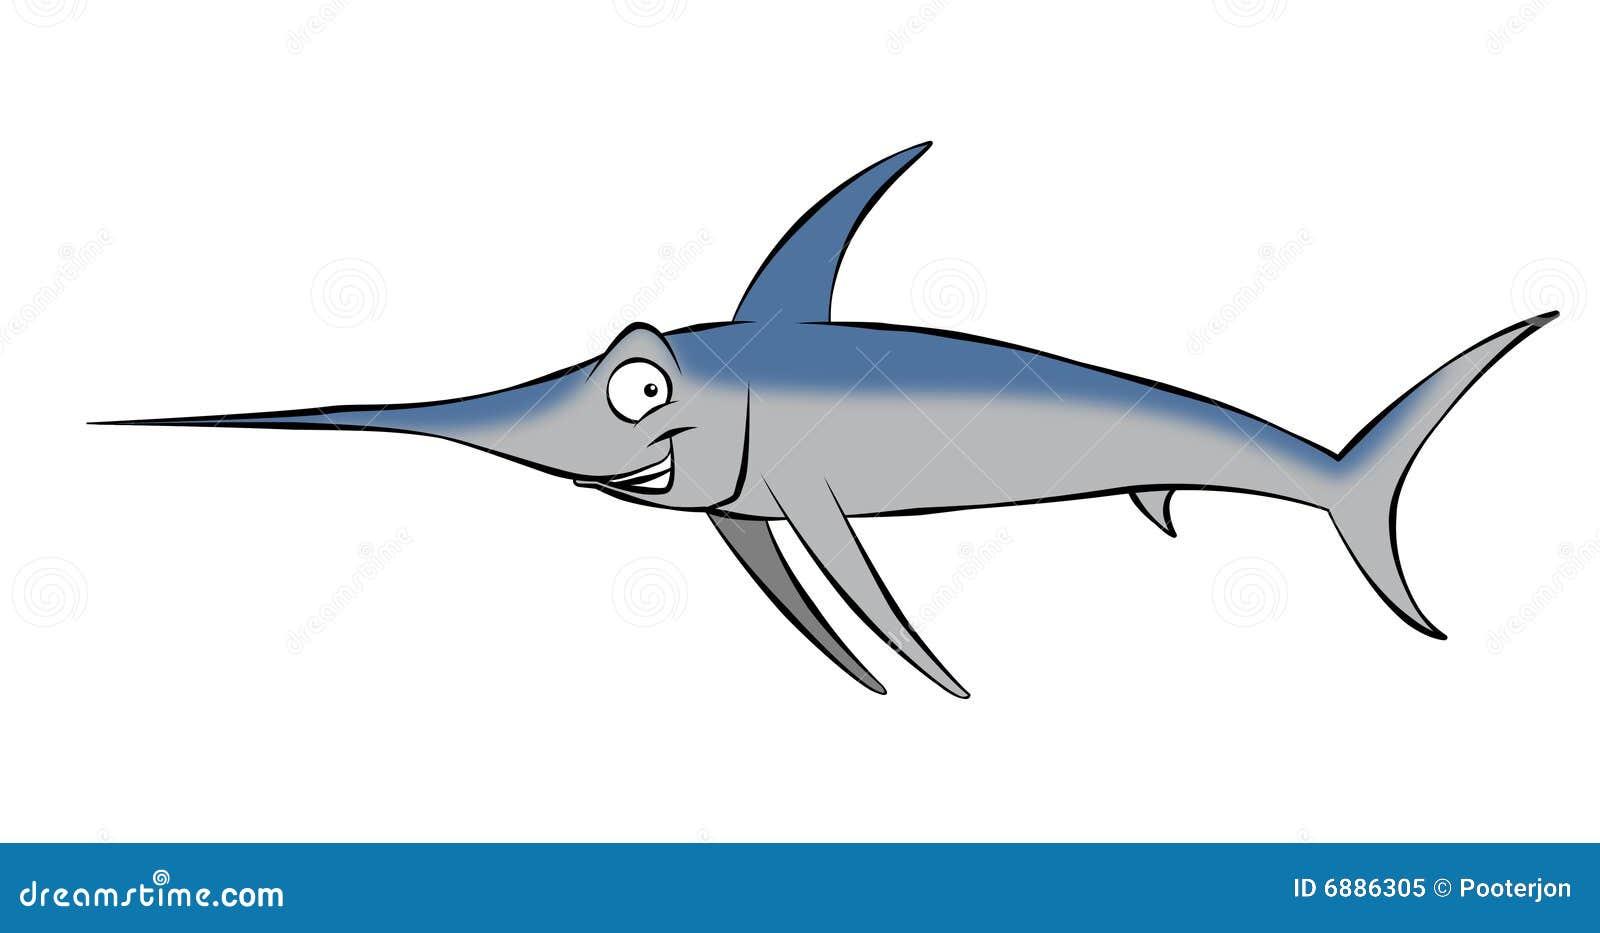 swordfish stock illustrations 1 175 swordfish stock illustrations rh dreamstime com swordfish outline clipart swordfish clipart